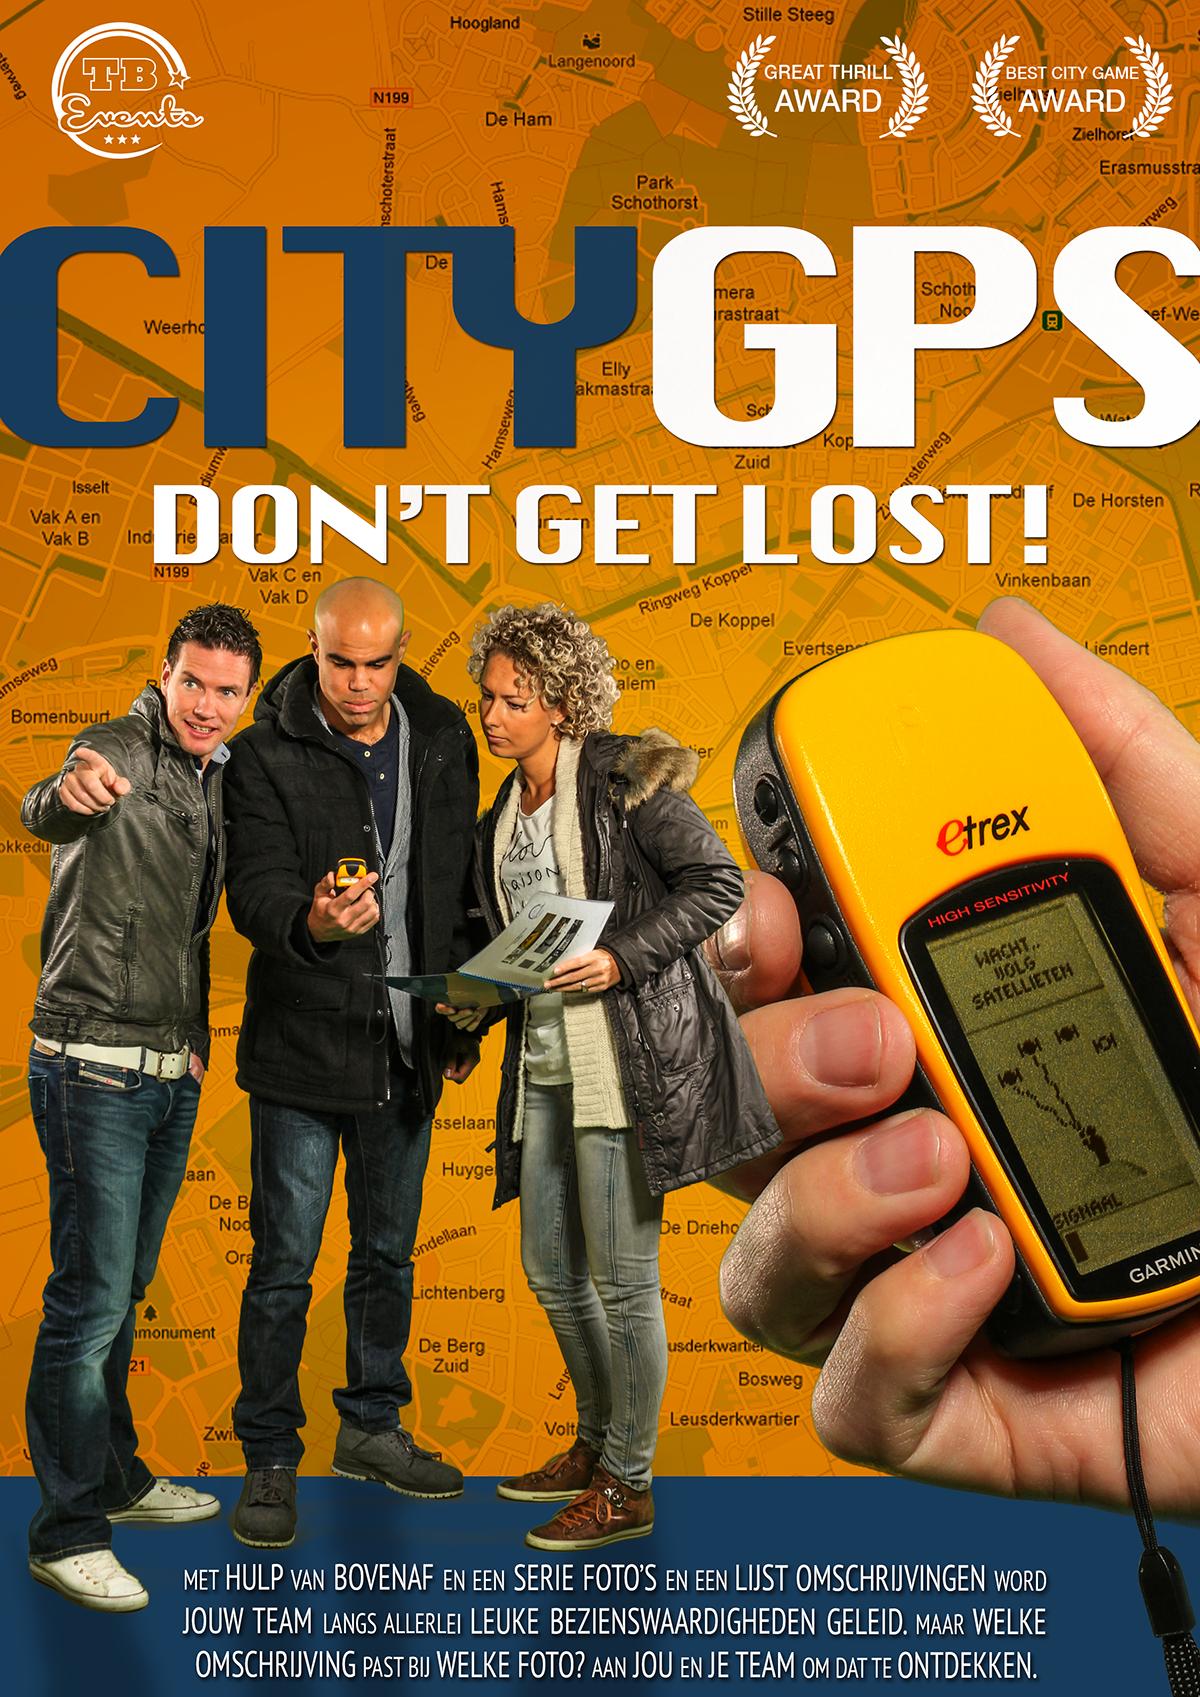 city-gps-tocht-spel-bedrijfsuitje-groepsuitje-dordrecht